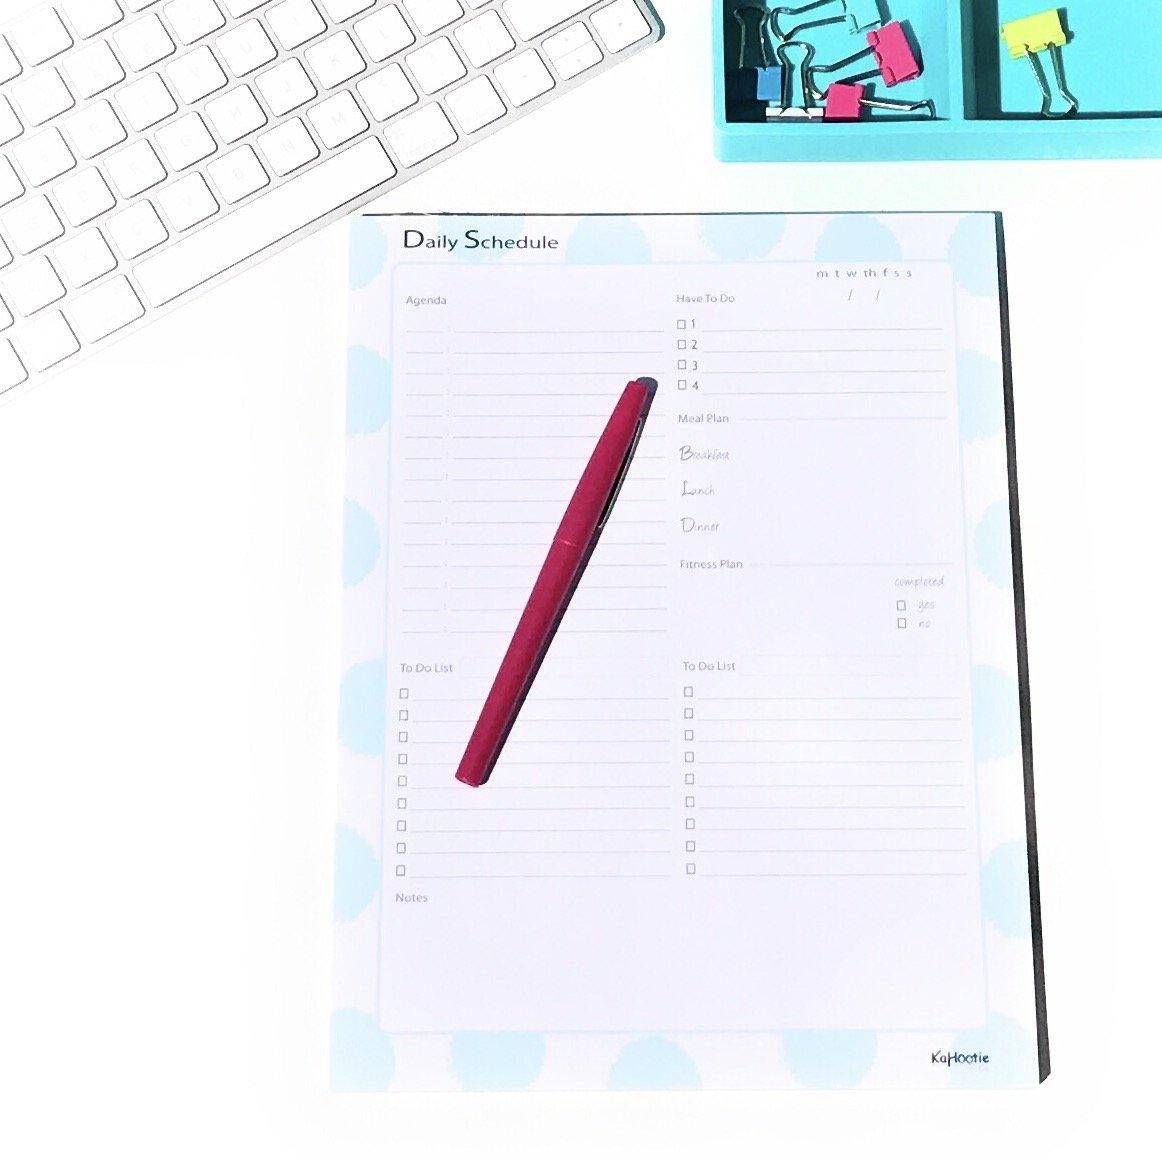 Libreta diario horario diario - Agenda, comida y Plan ...